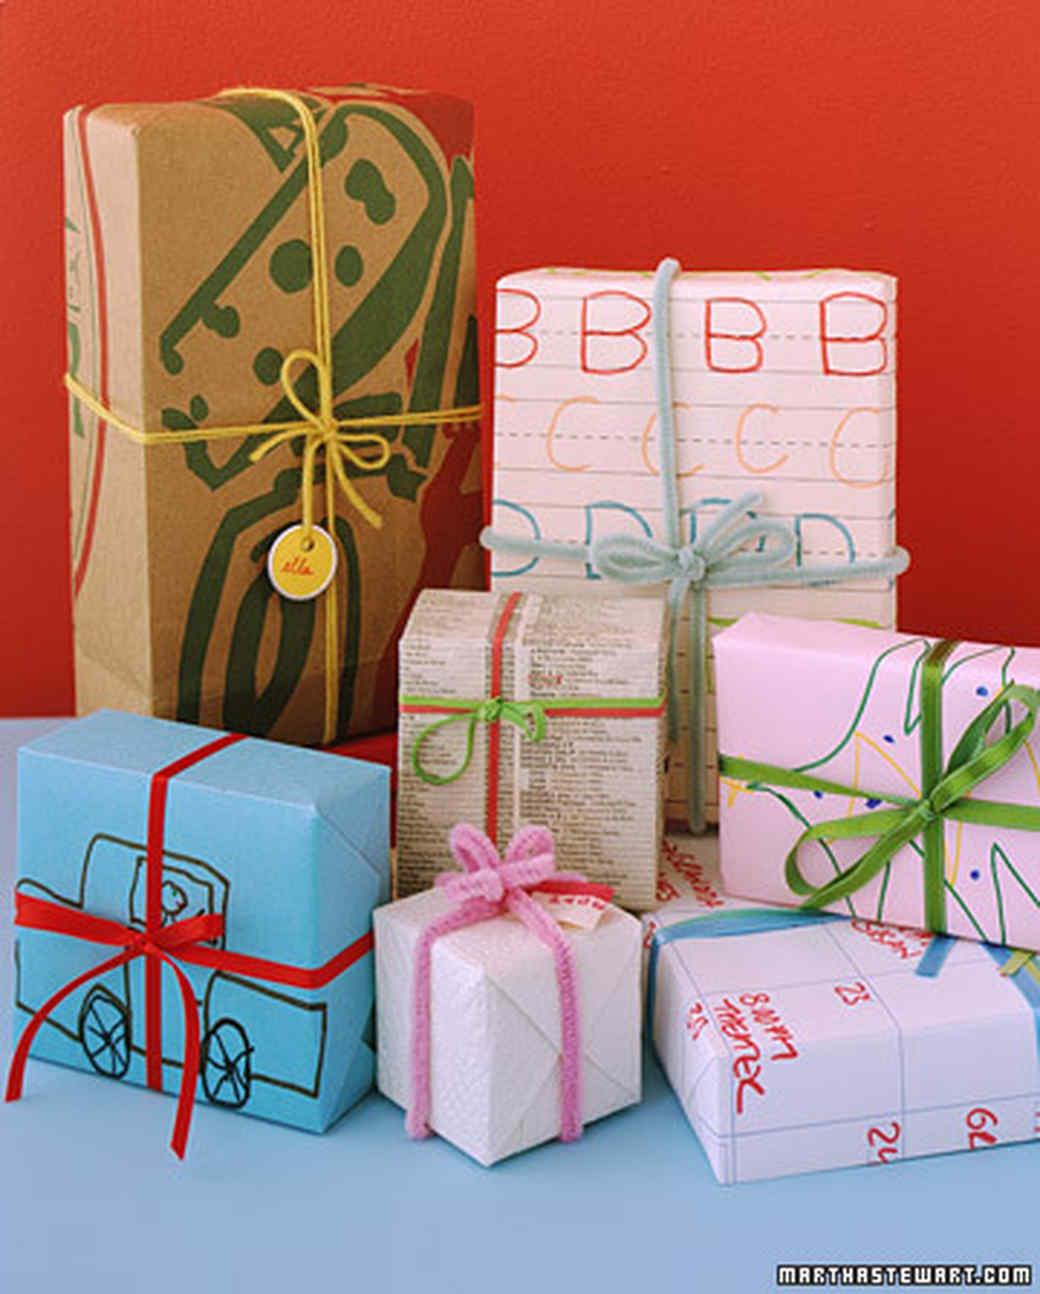 Gift wrapping ideas for kids martha stewart - Envolver regalos de forma original ...